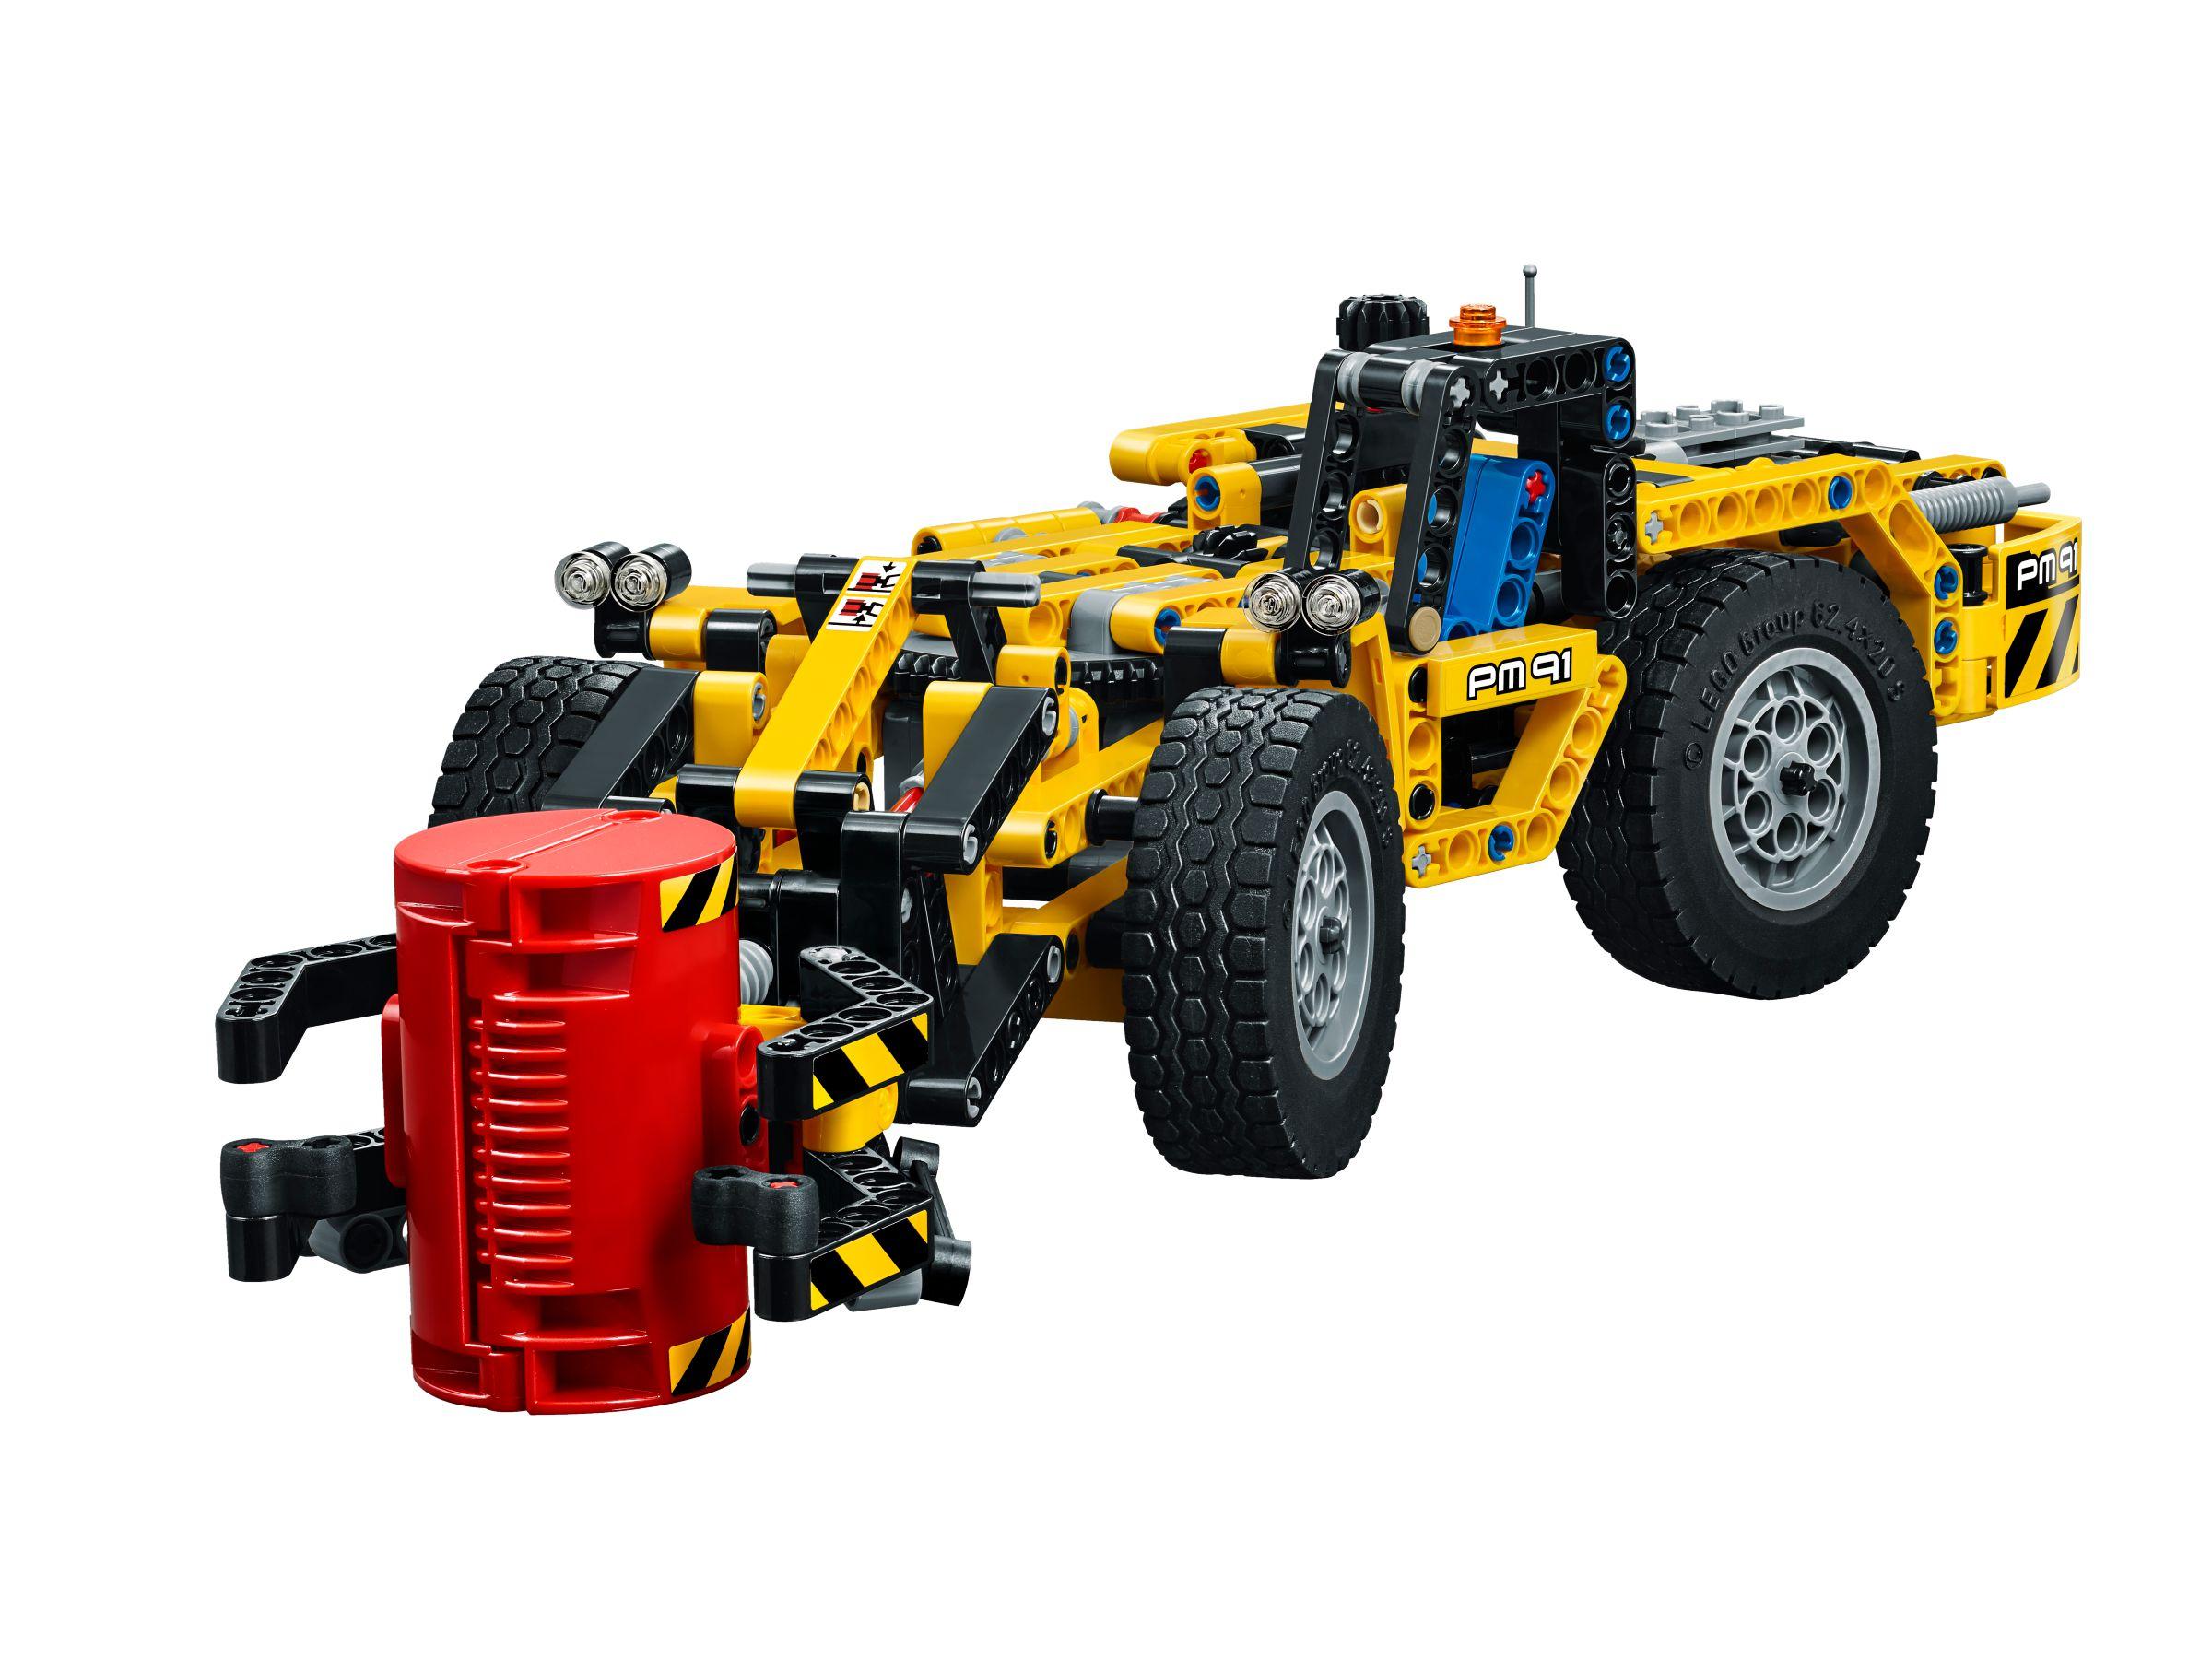 lego 42049 bergbau lader technic 2016 mine loader brickmerge. Black Bedroom Furniture Sets. Home Design Ideas